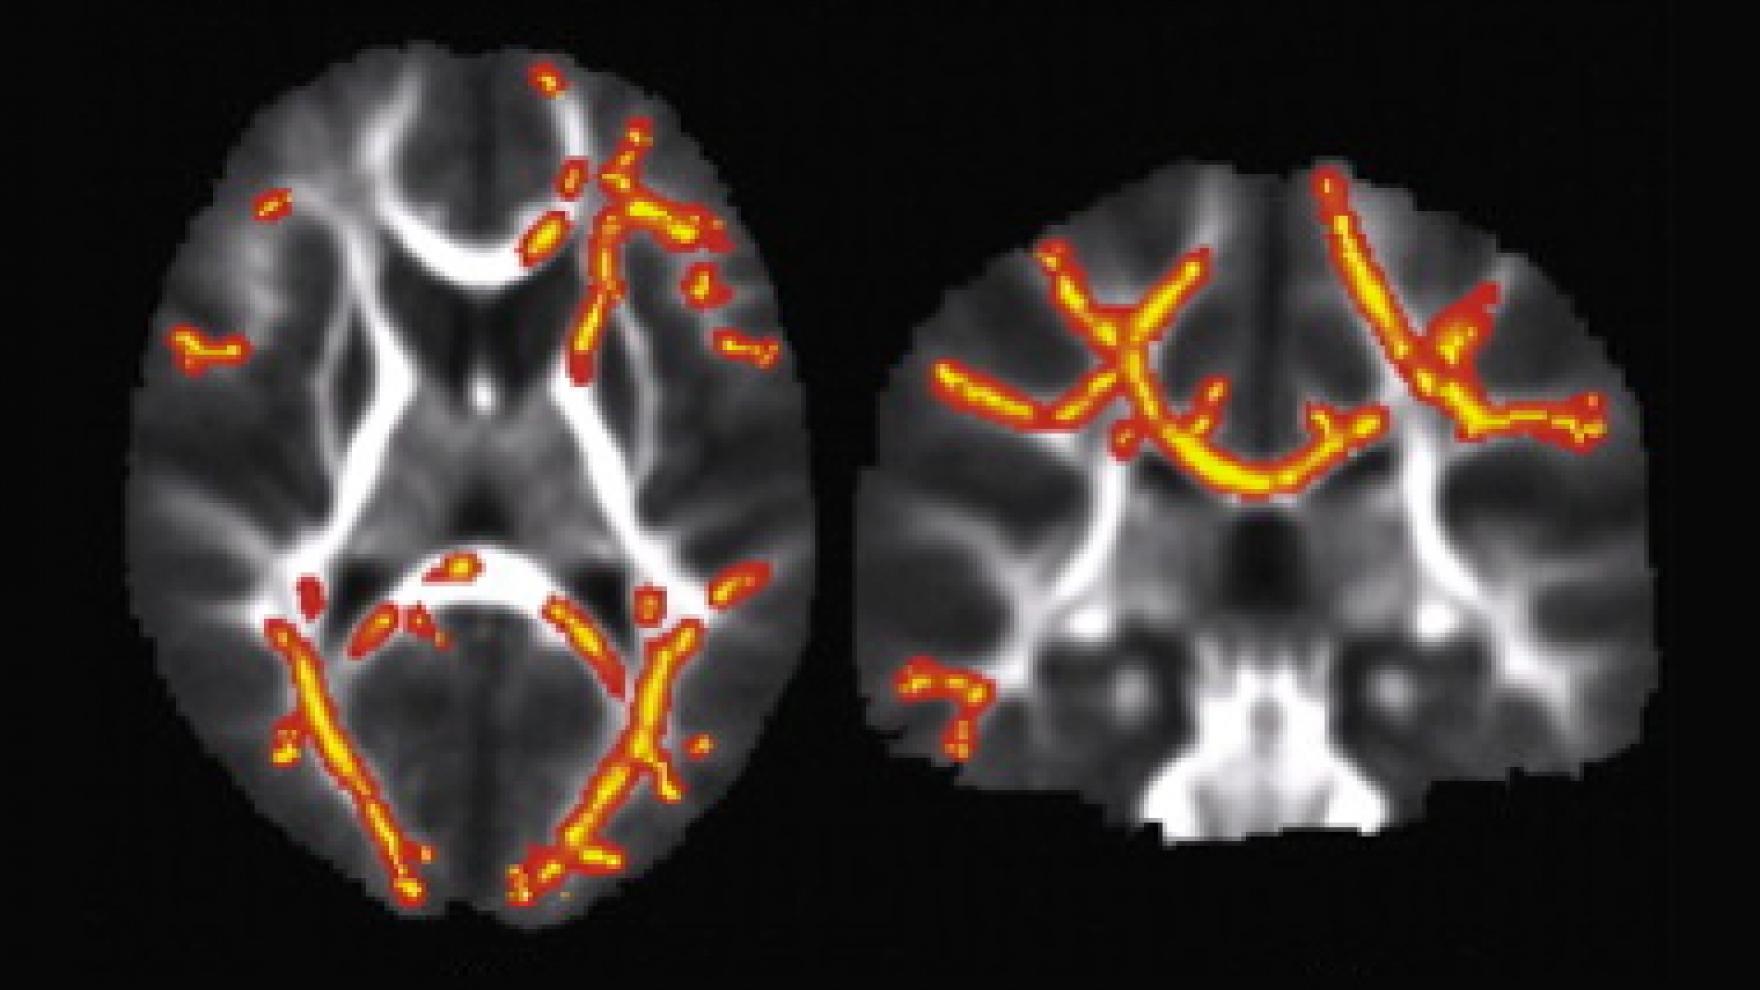 Breakthrough Study Reveals Biological >> Breakthrough Study Reveals Biological Basis for Sensory Processing Disorders in Kids | UC San ...